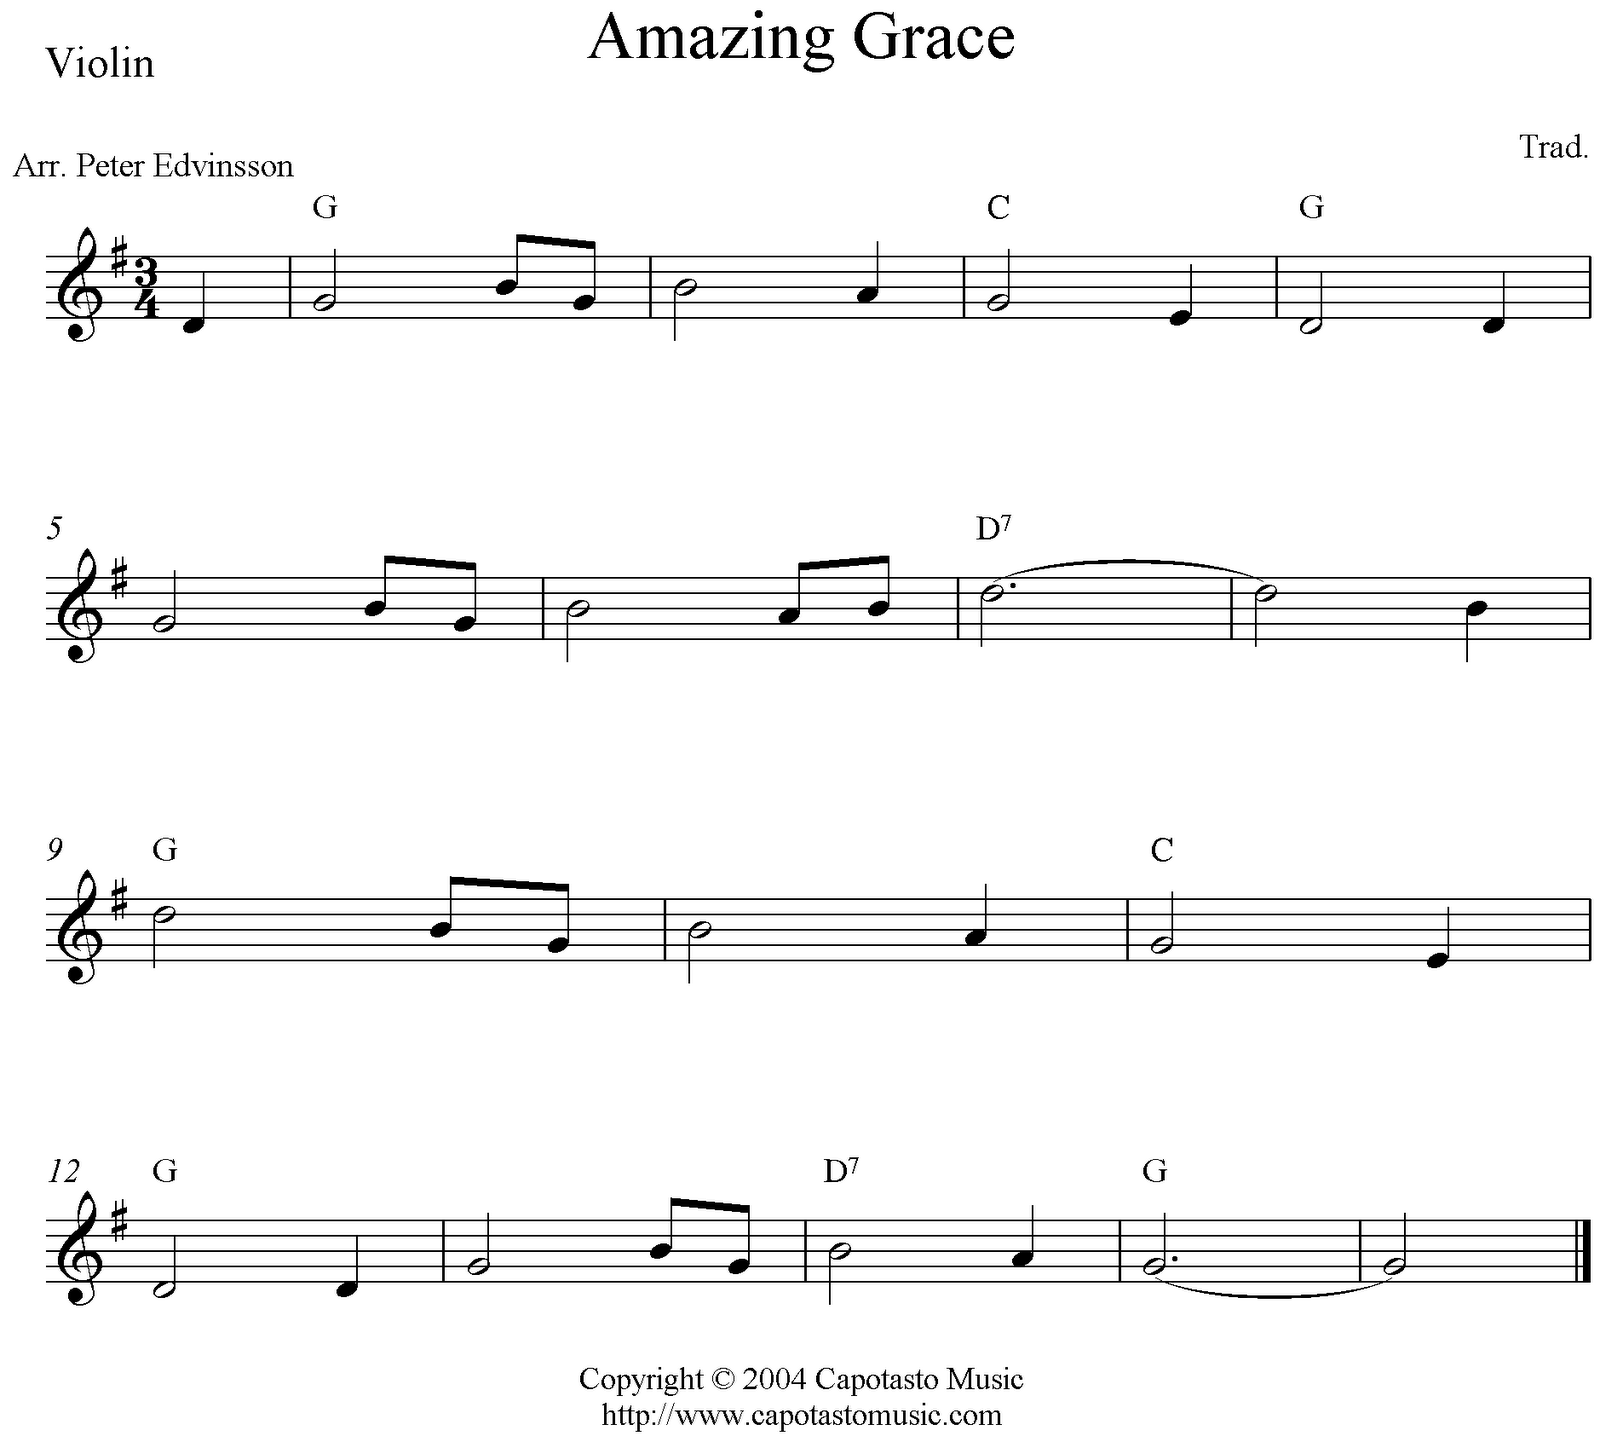 Christmas Canon Lyrics Sheet Music: Amazing Grace Sheet Music For Guitar